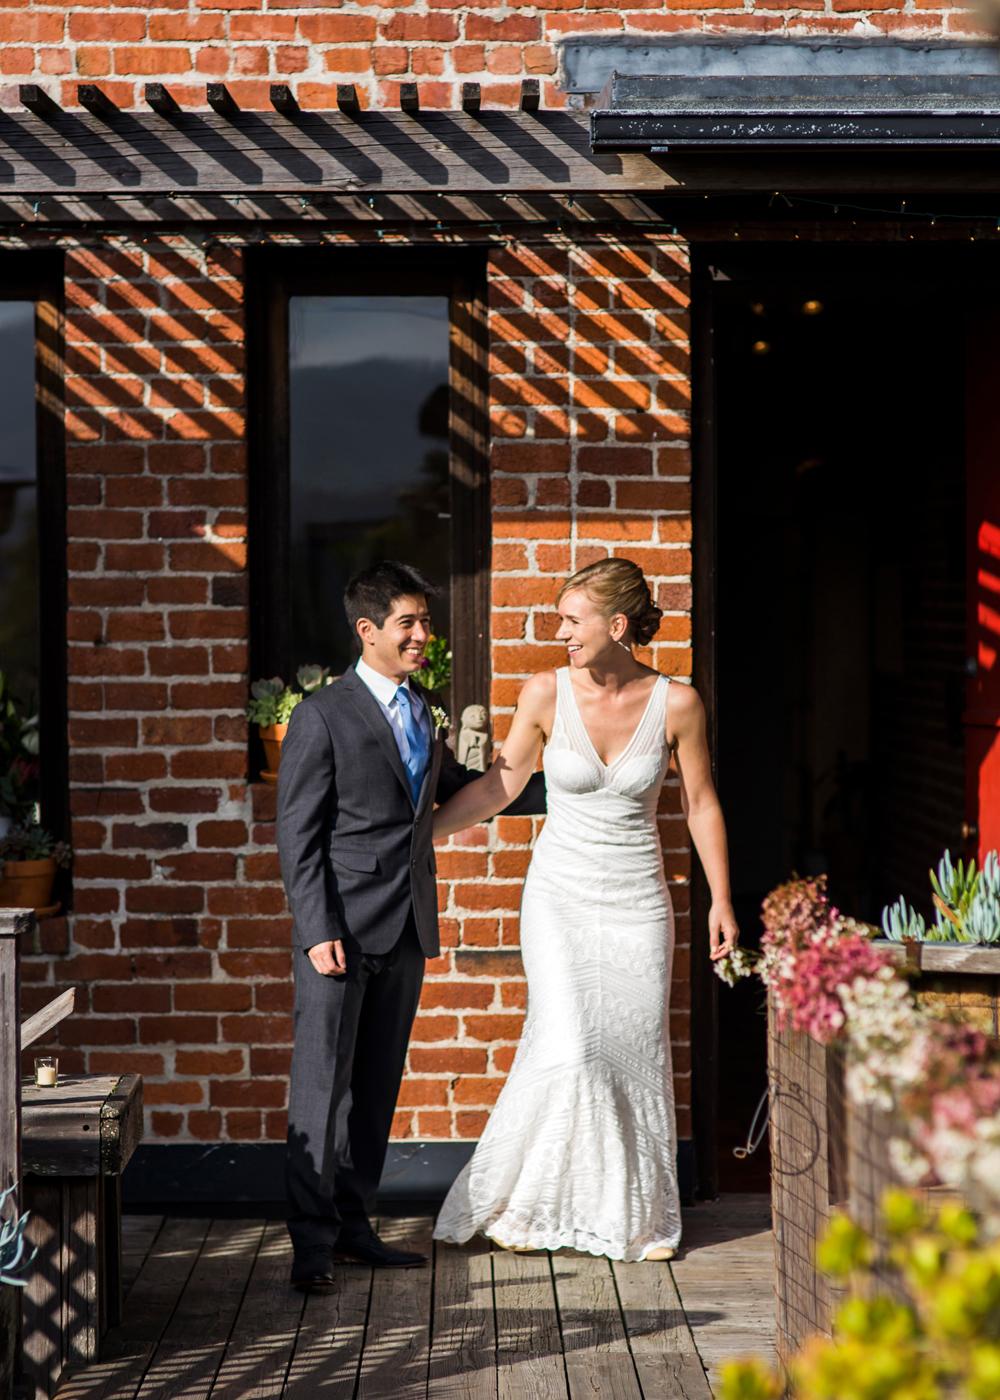 presidio-wedding-photography-lilouette-017.jpg